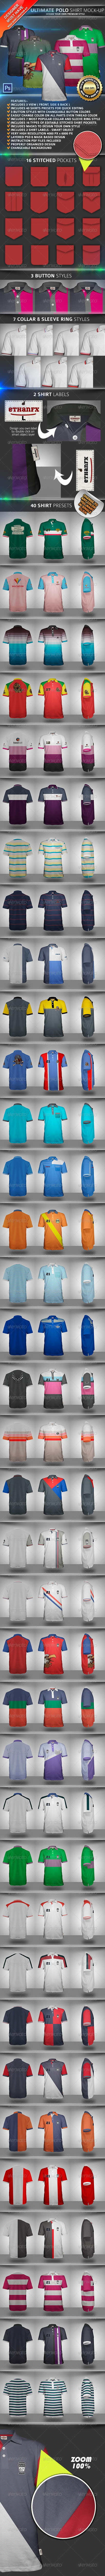 Polo Shirt Mock-Up - Apparel Product Mock-Ups